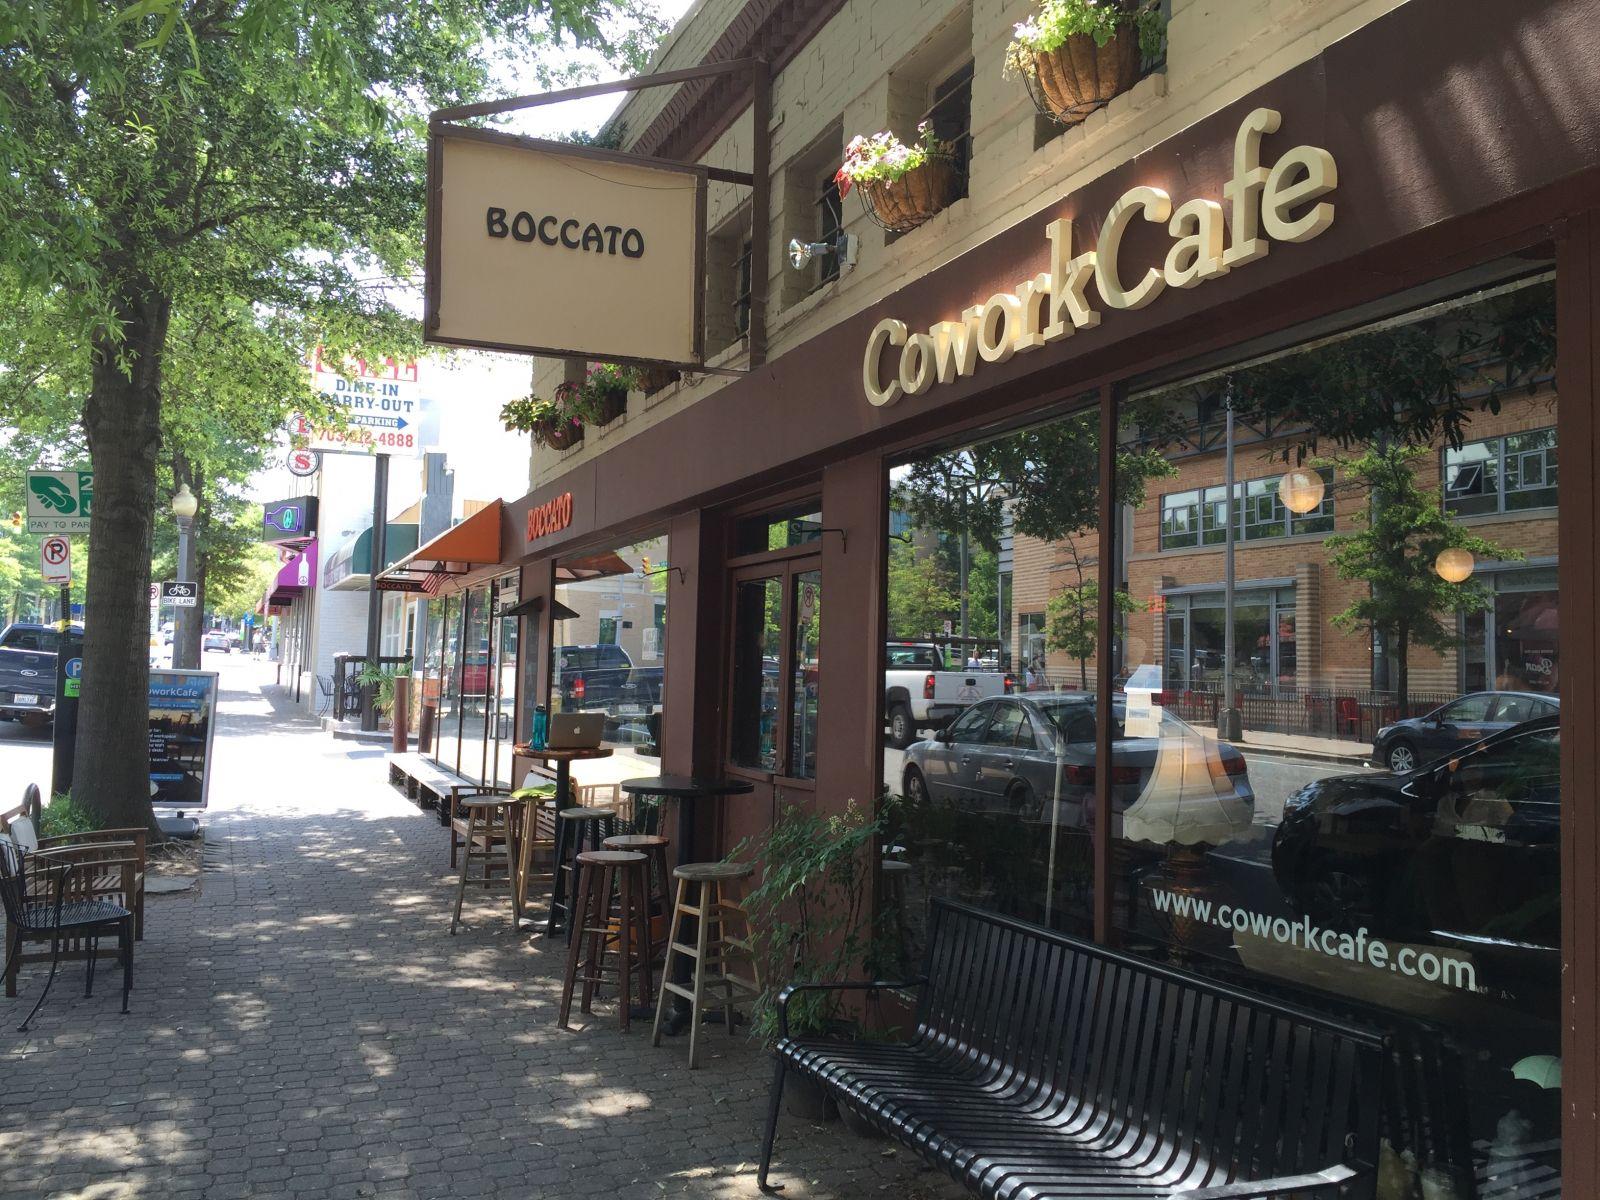 CoworkCafe, Arlington